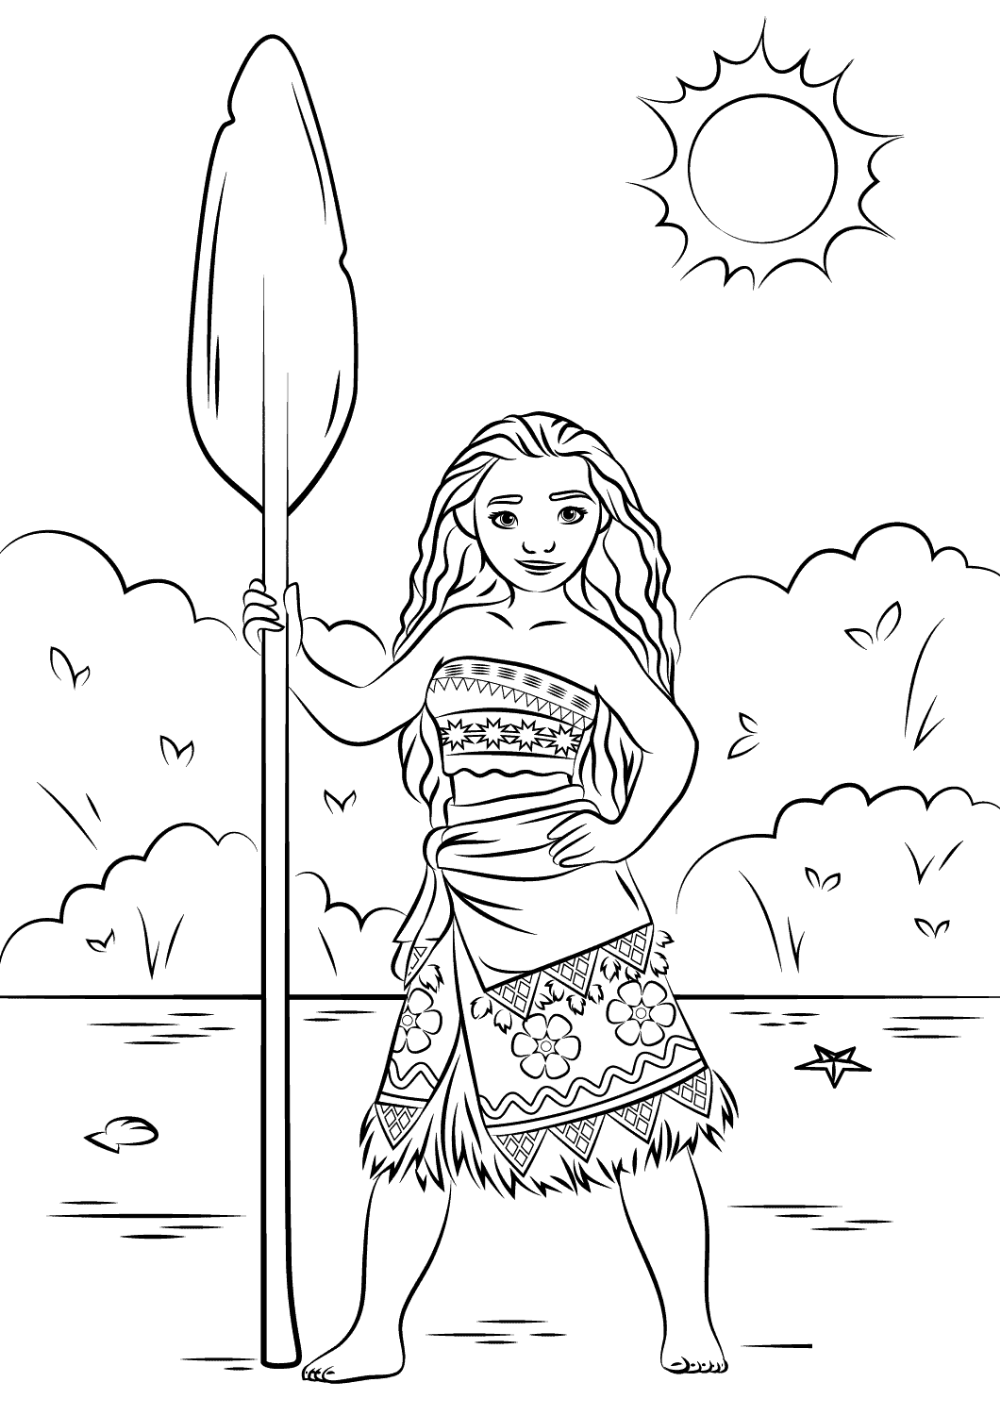 Moana Coloring Book Worksheet For Kids Educative Printable Disney Princess Coloring Pages Moana Coloring Pages Princess Coloring Pages